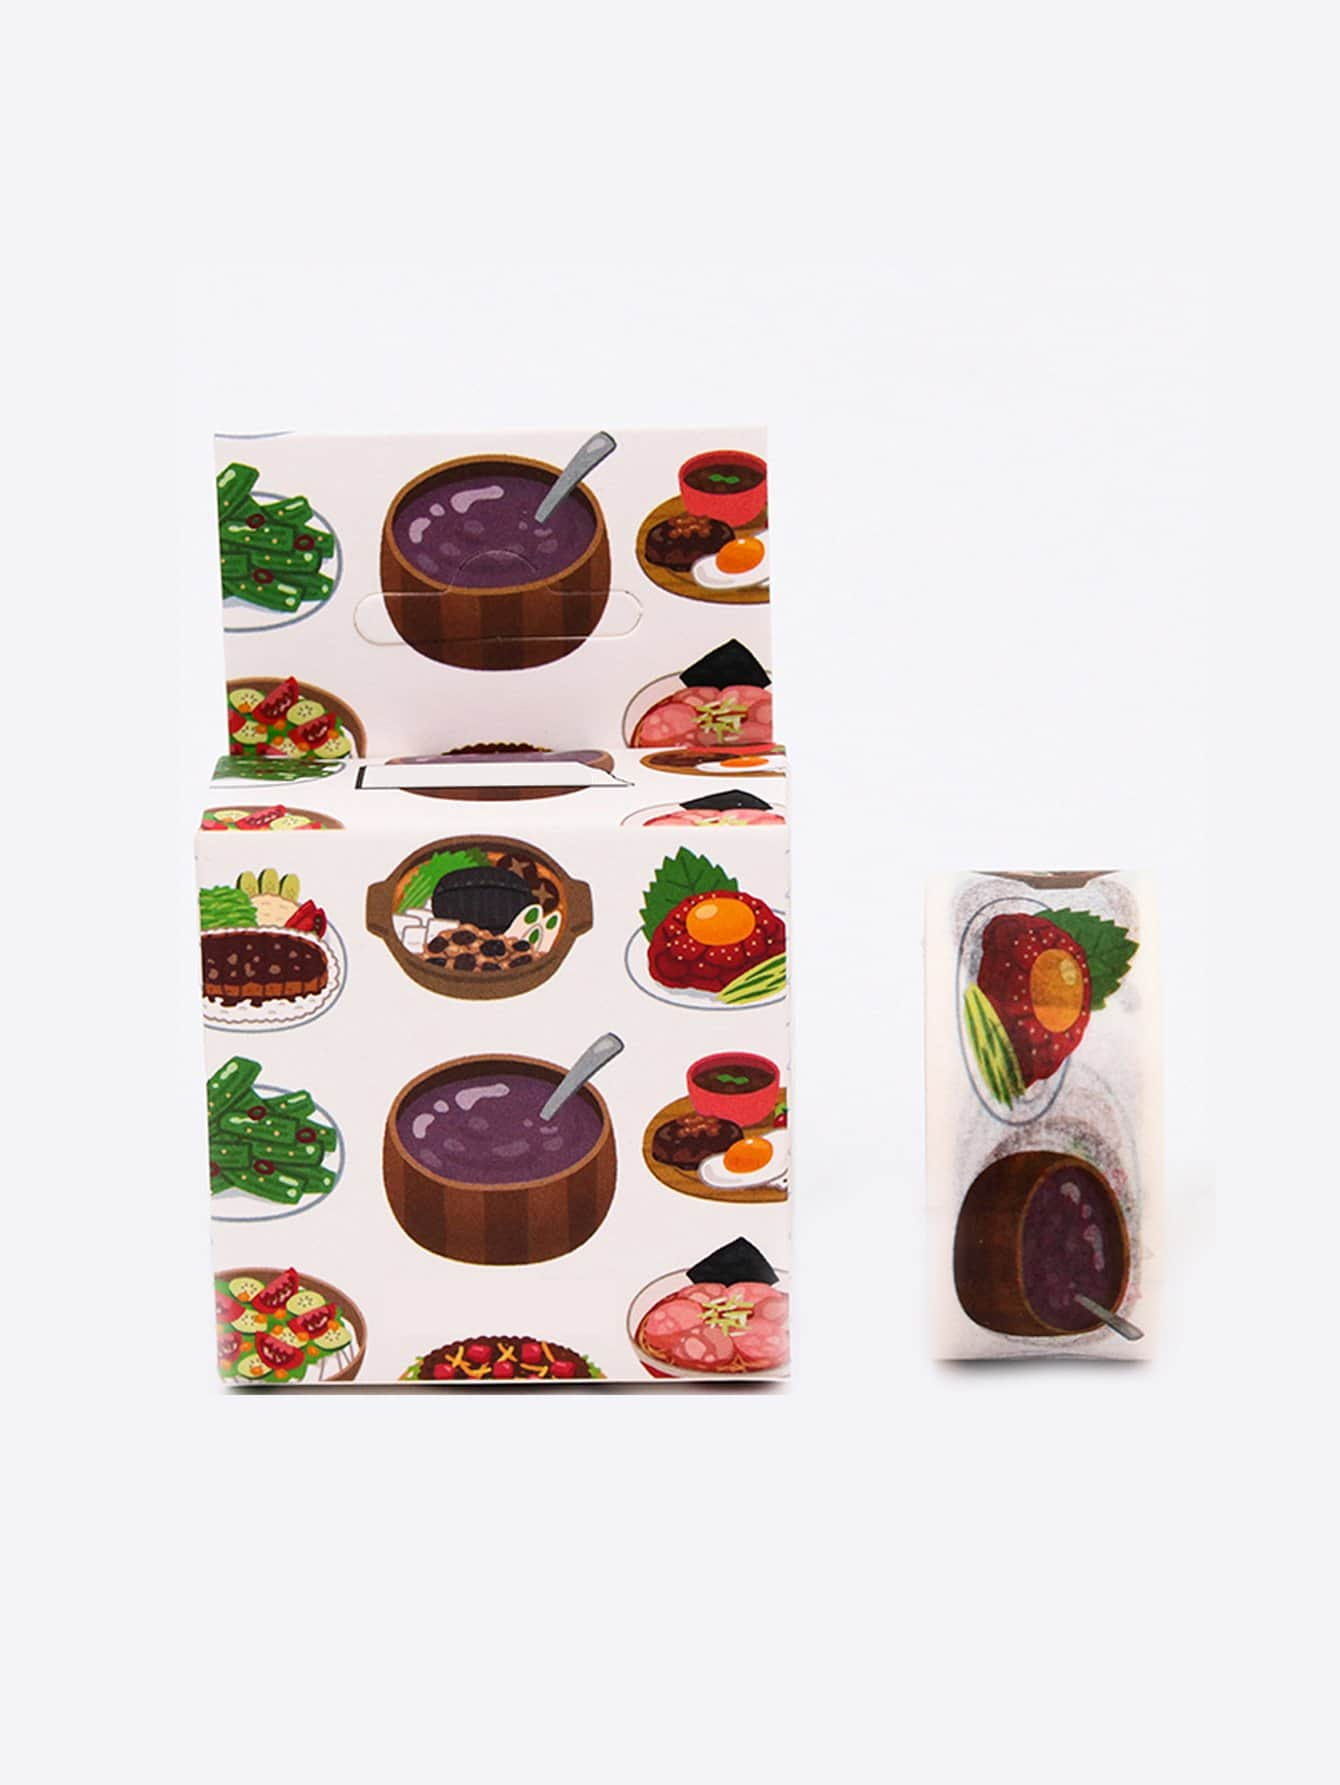 Cartoon Soup Adhesive Tape sunglasses pattern adhesive tape